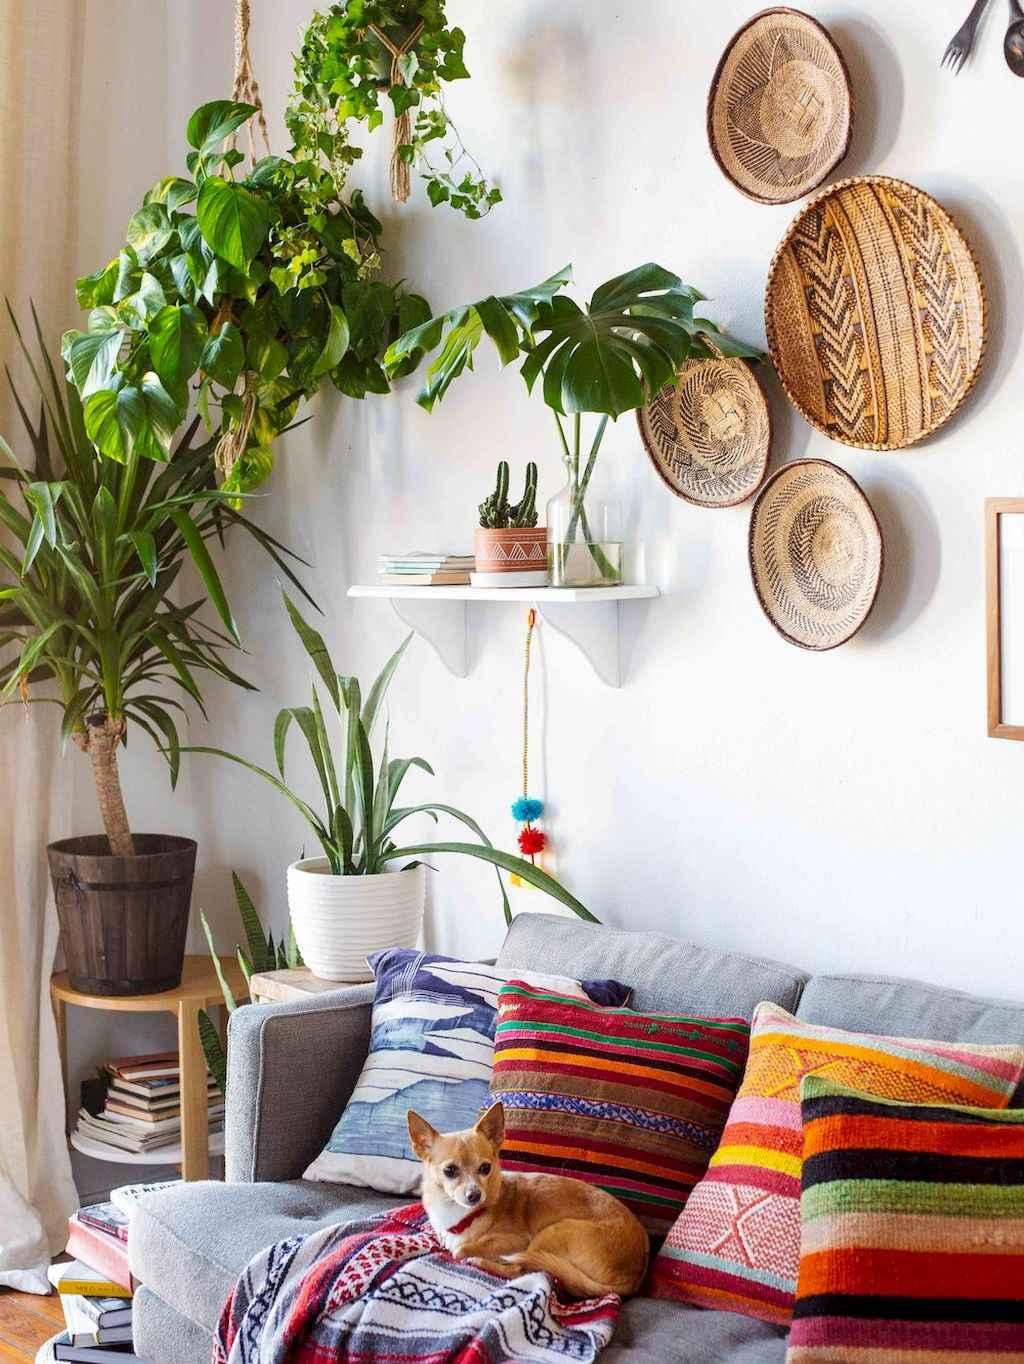 Simple clean vintage living room decorating ideas (5)